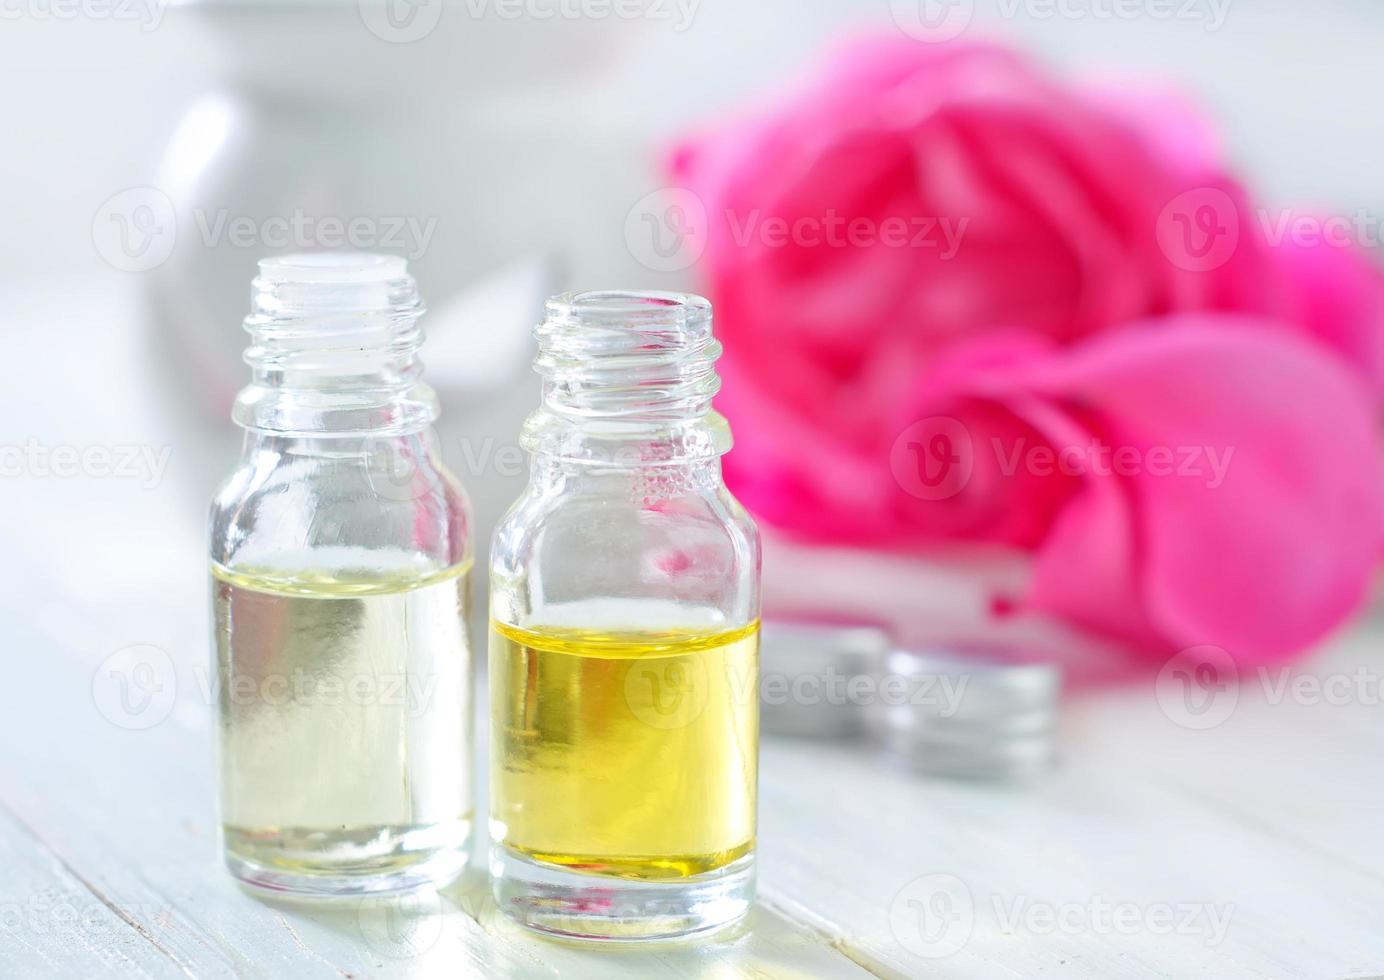 rose oil photo